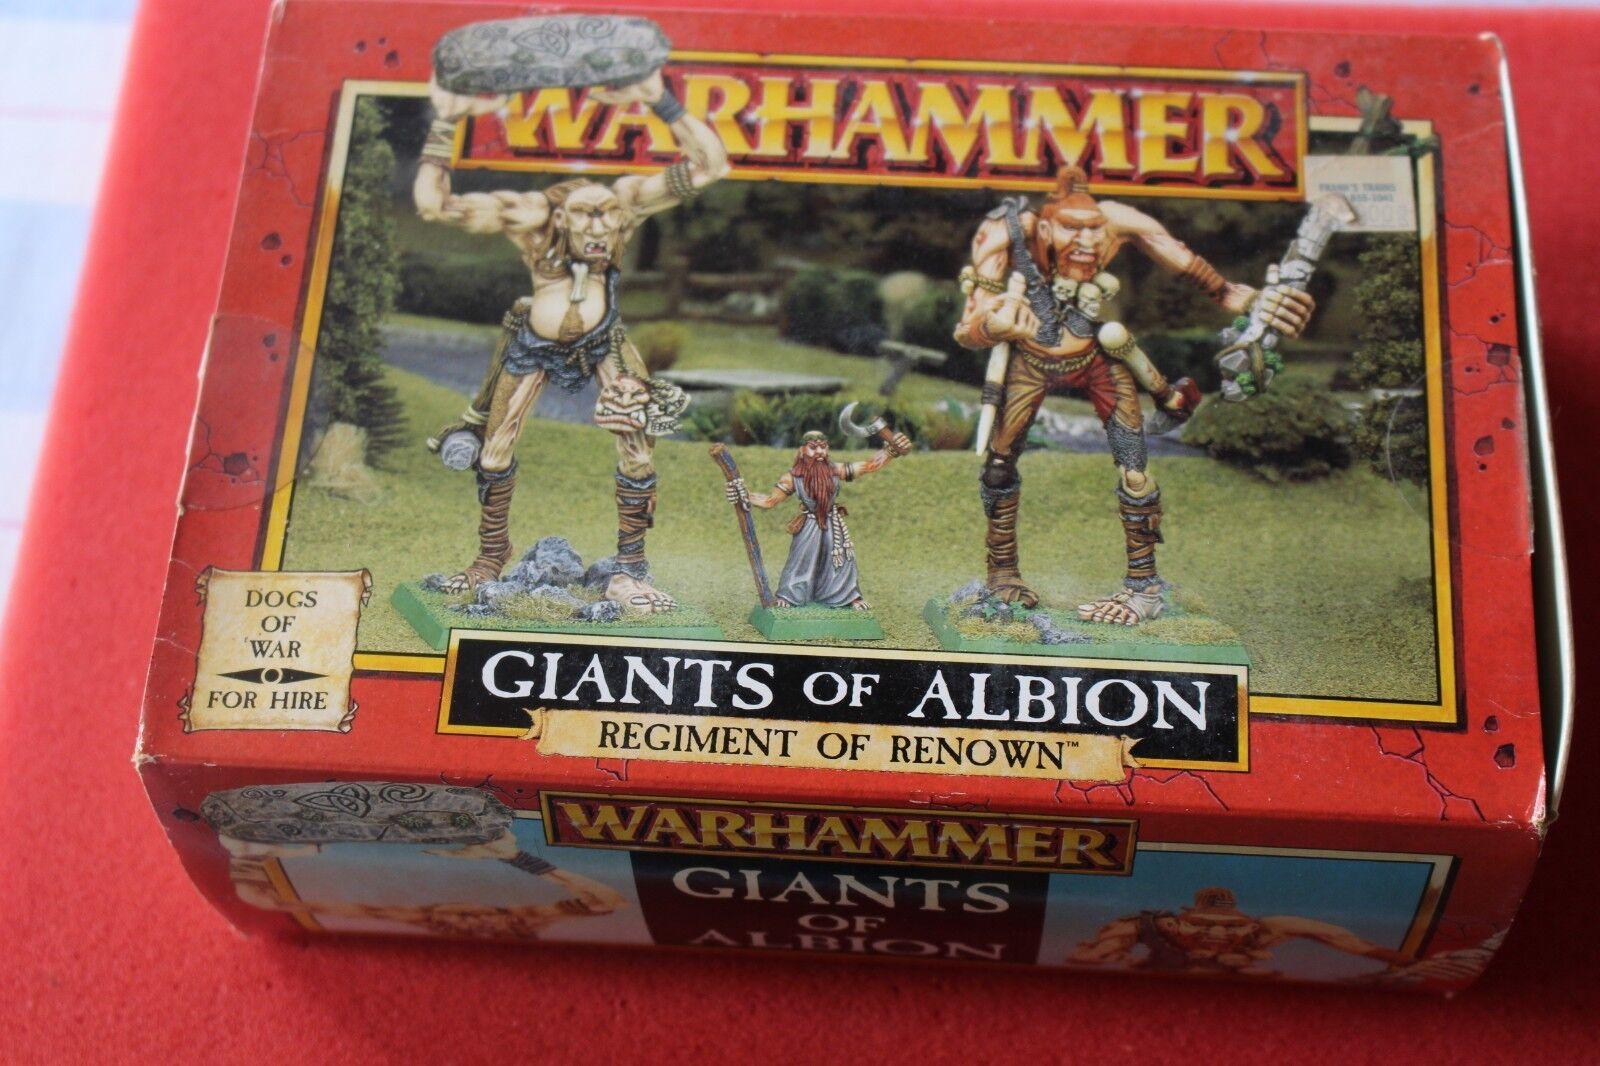 Spel arbetarhop Dogs of War Giants of Albion Warhammer lådaad Set New Metal Figur